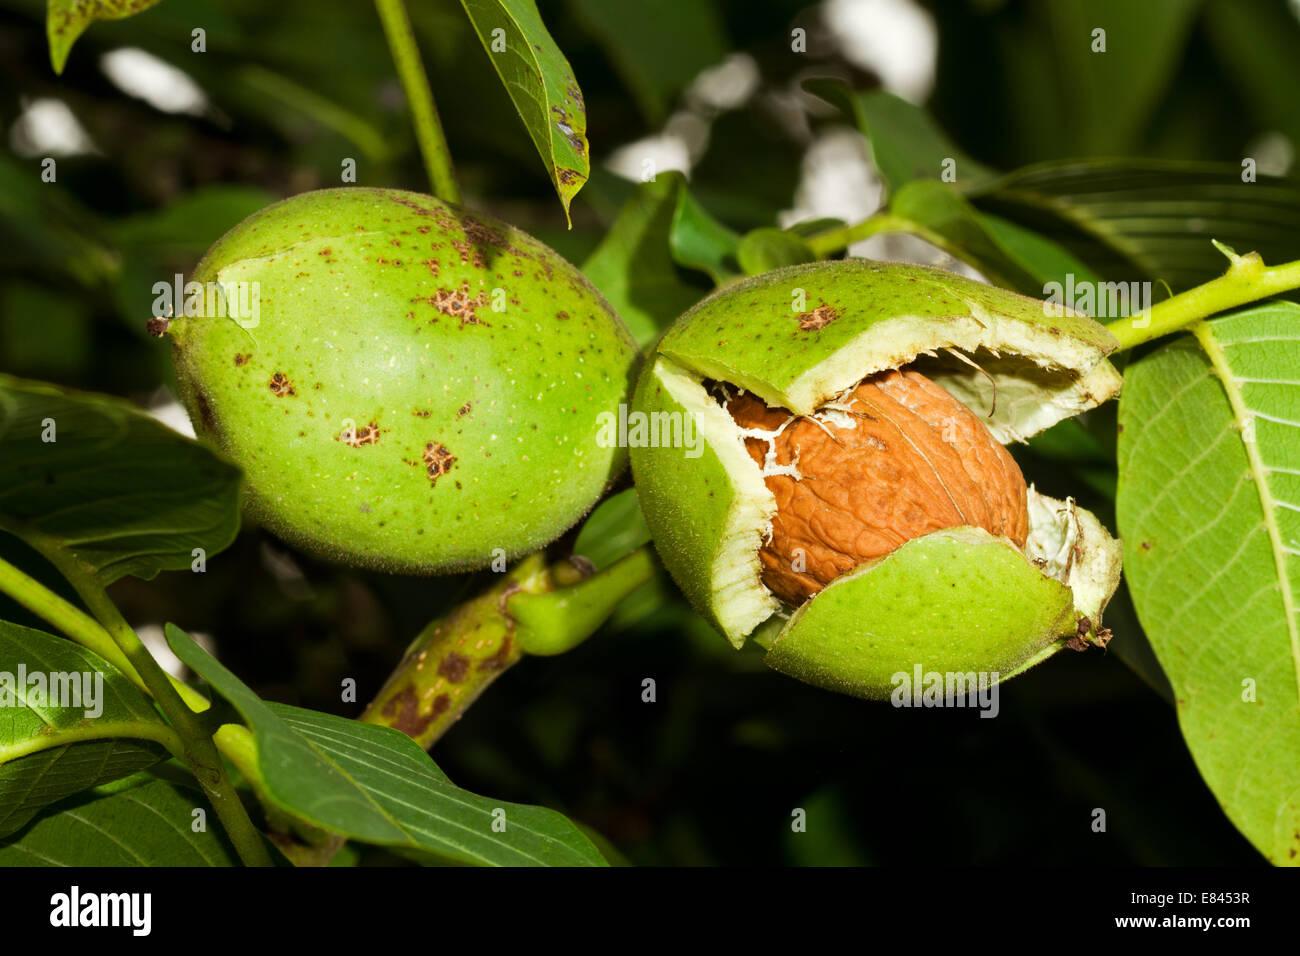 Ripe nuts of a Walnut tree Stock Photo